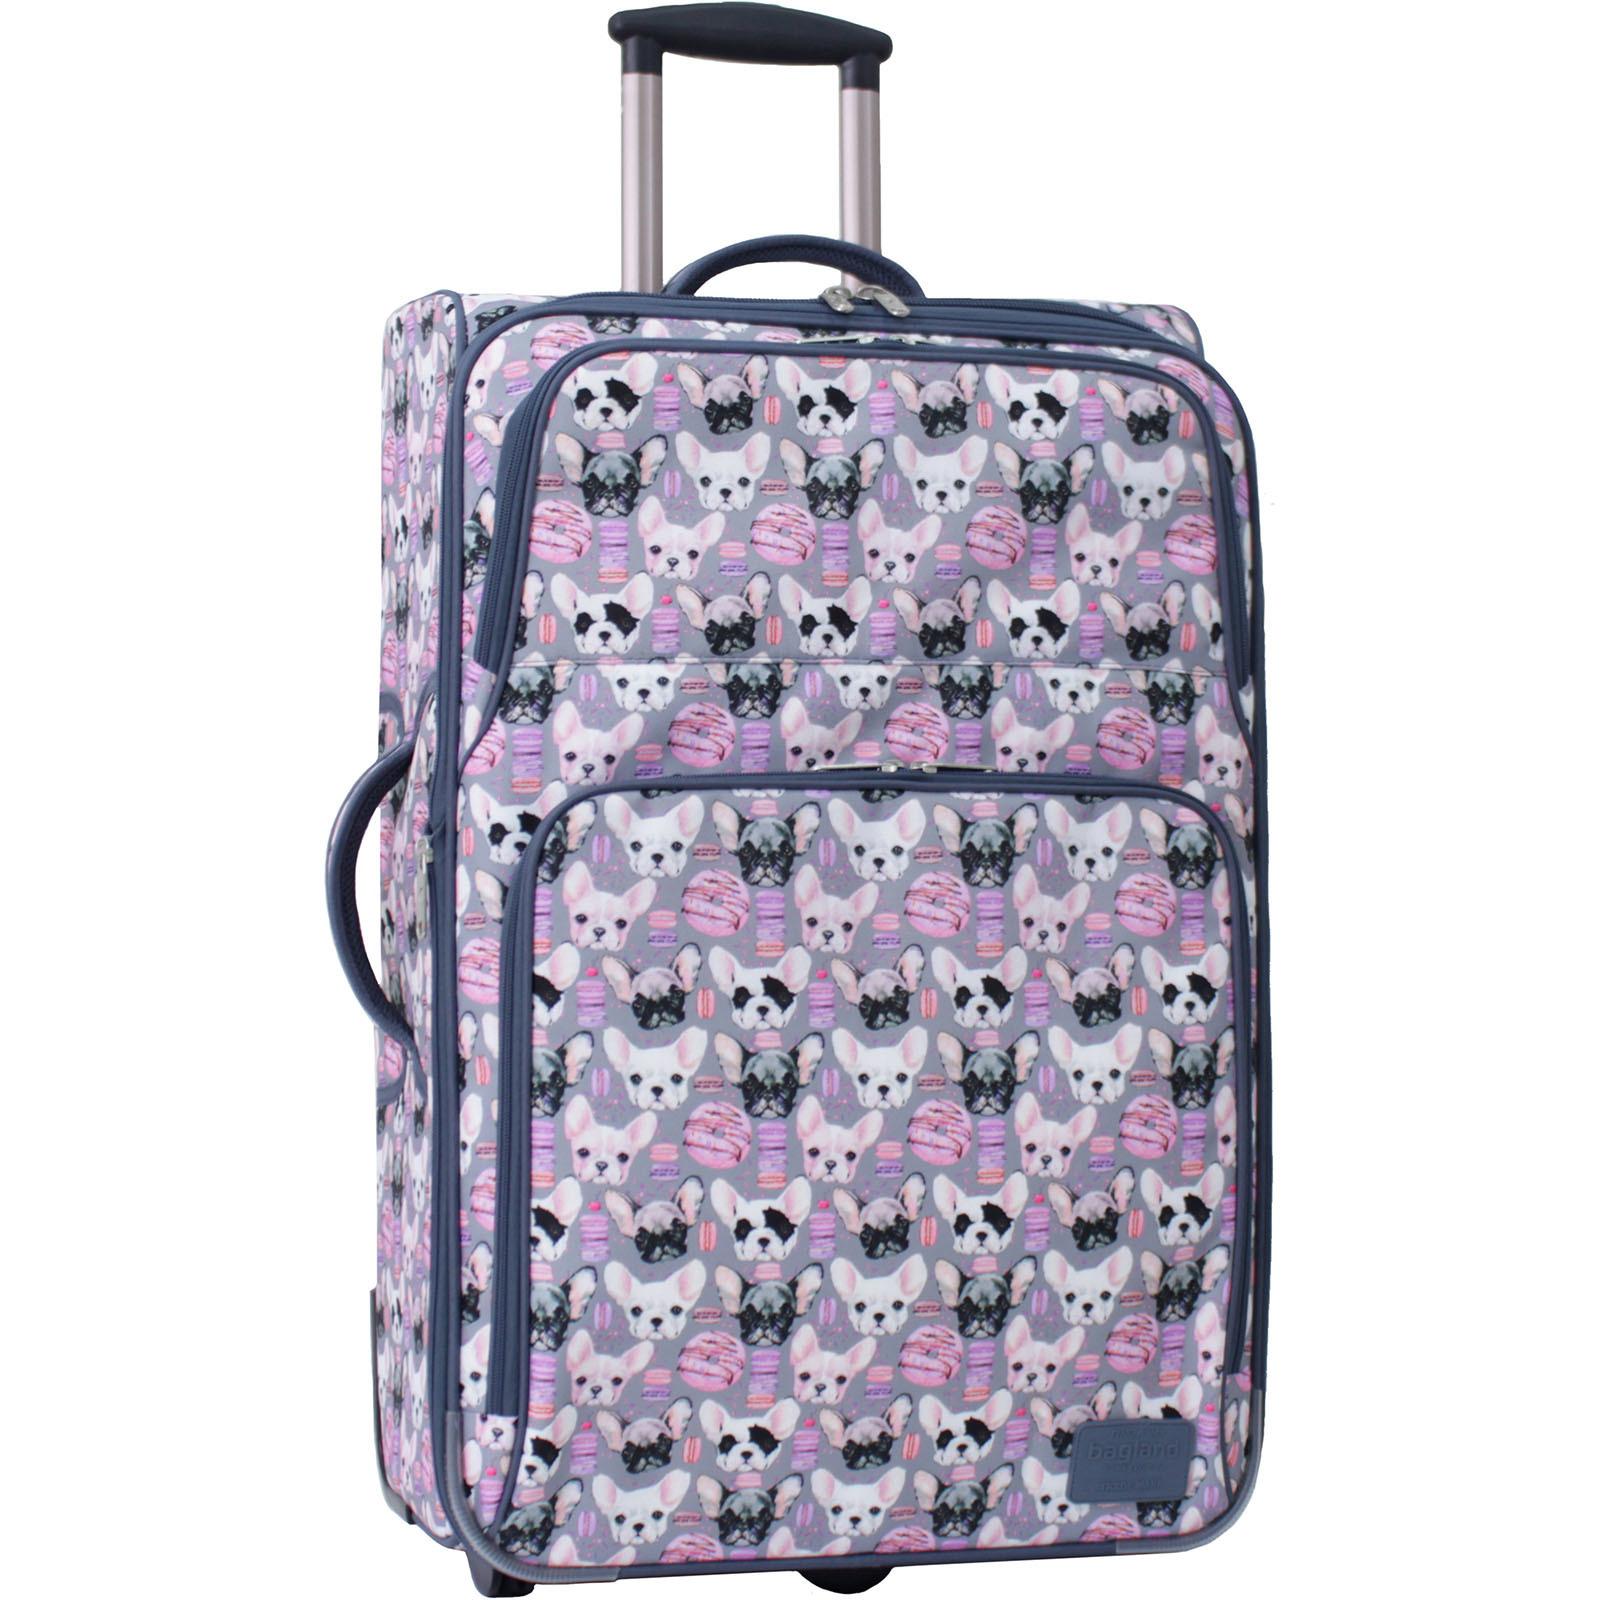 Дорожные чемоданы Чемодан Bagland Леон большой дизайн 70 л. сублімація 144 (0037666274) IMG_0808__арт.144_.JPG